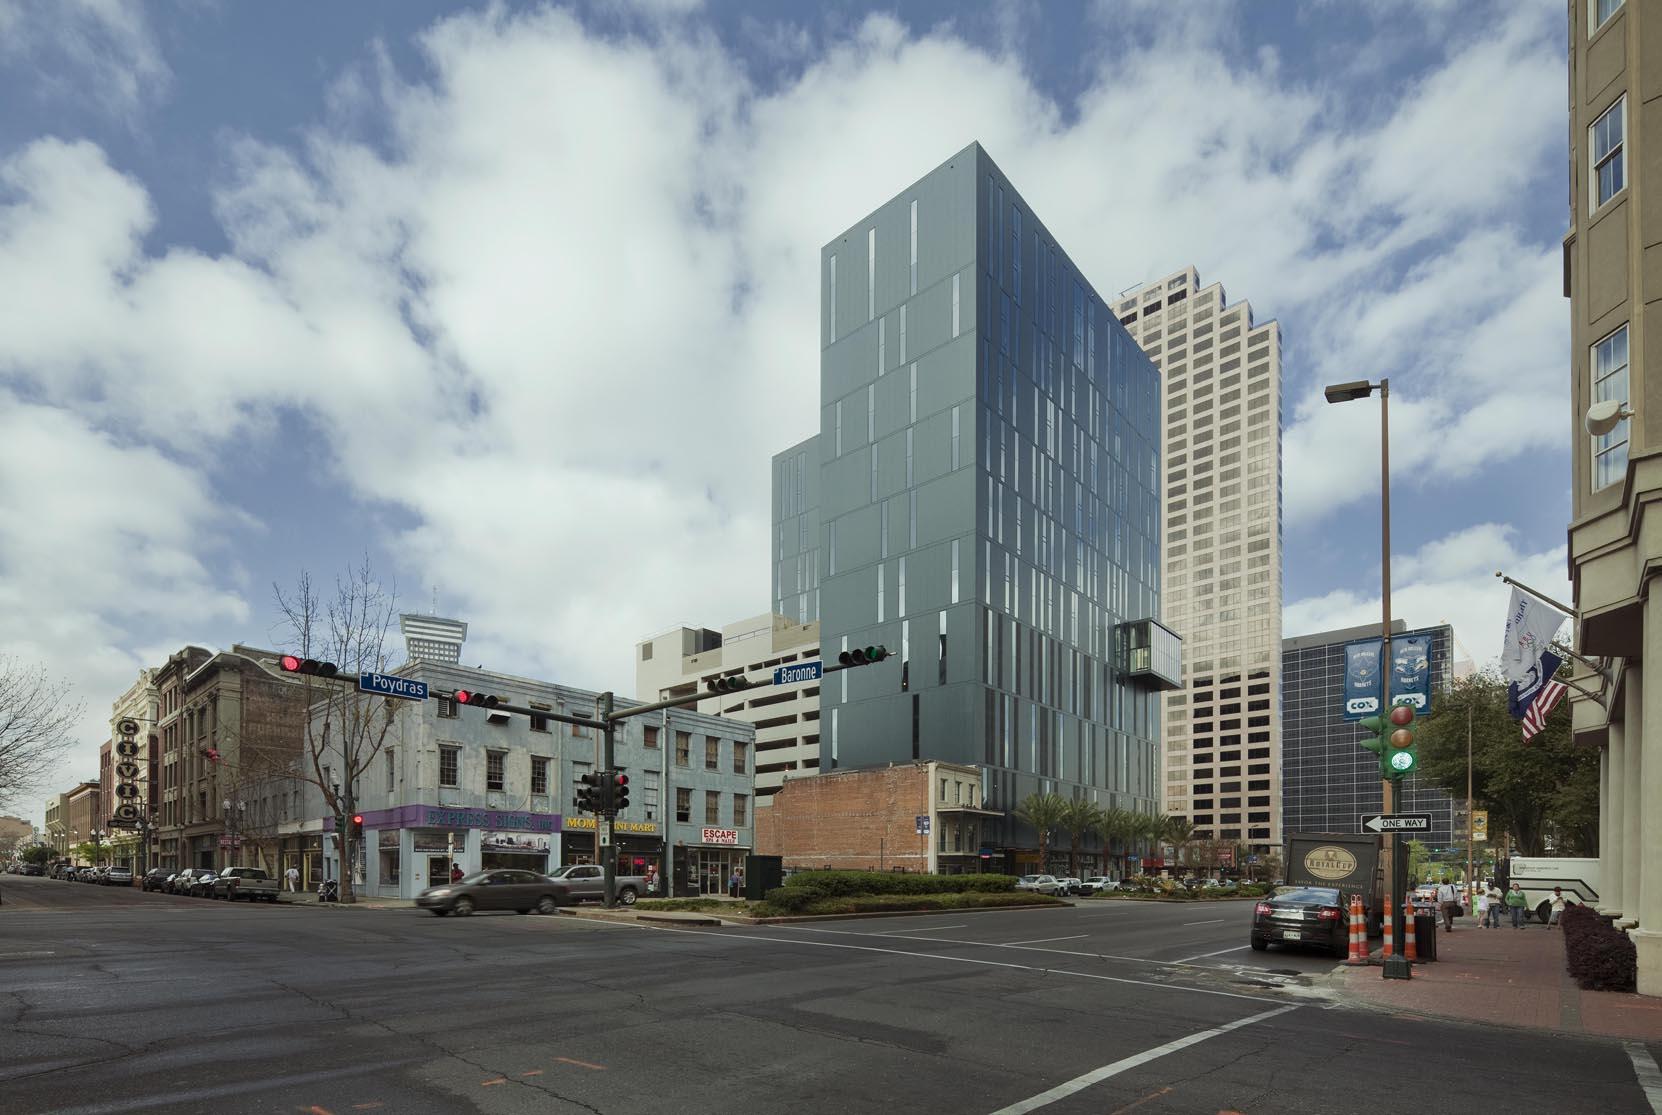 930 Poydras Residential Tower, New Orleans / Eskew+Dumez+Ripple